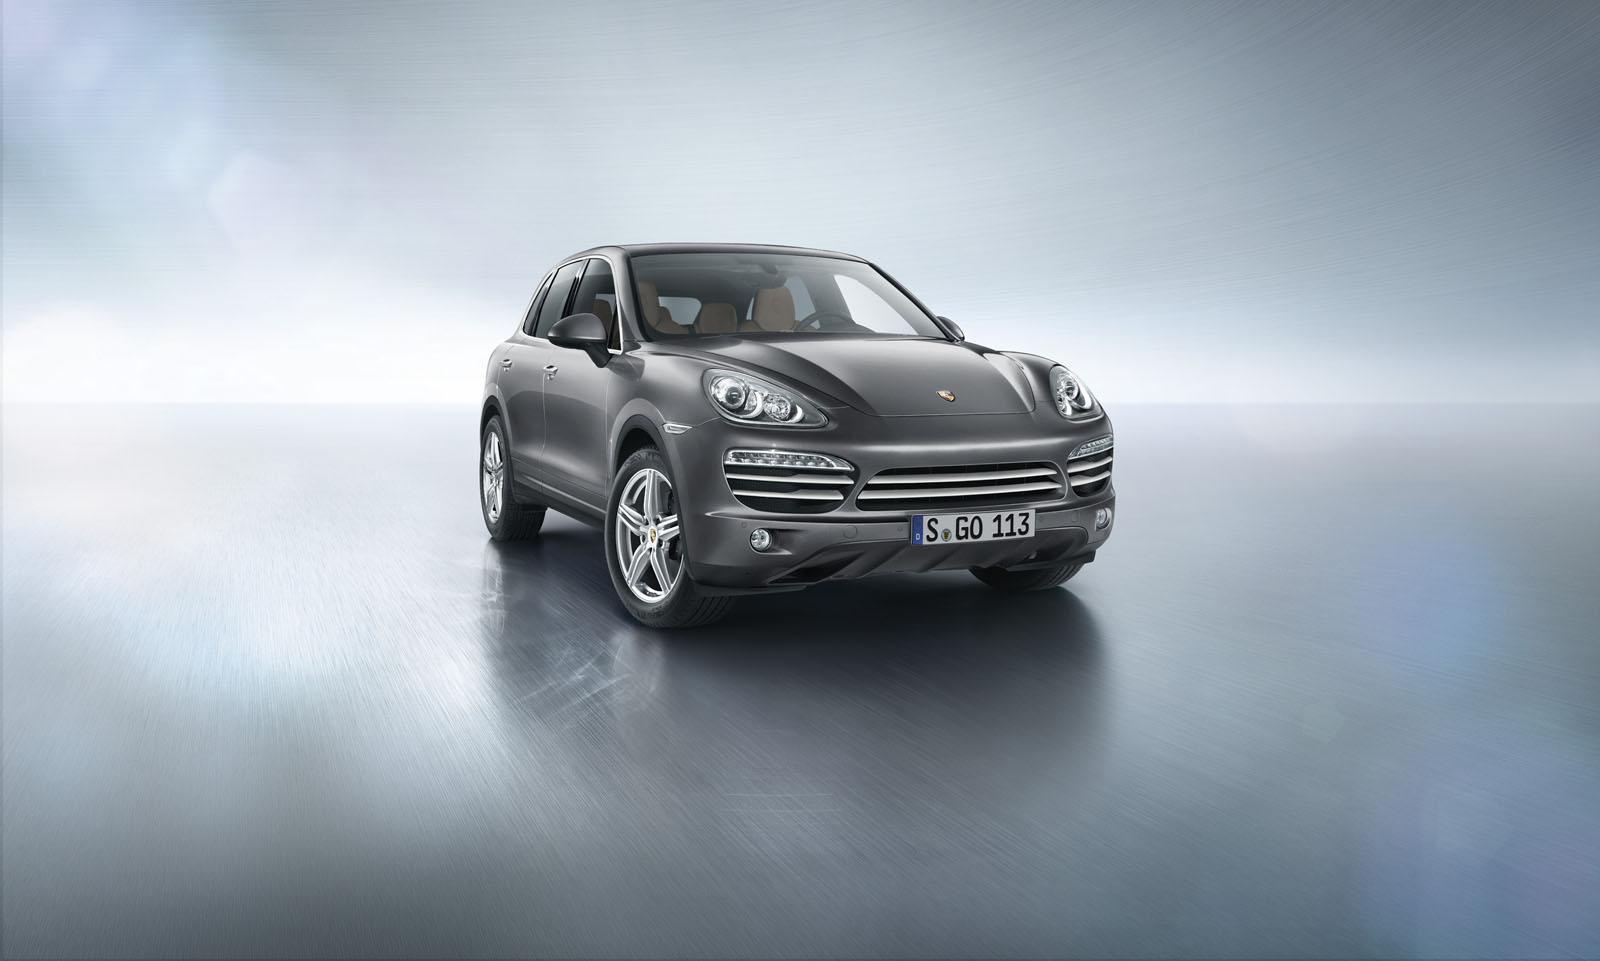 Porsche launches Cayenne Platinum Edition